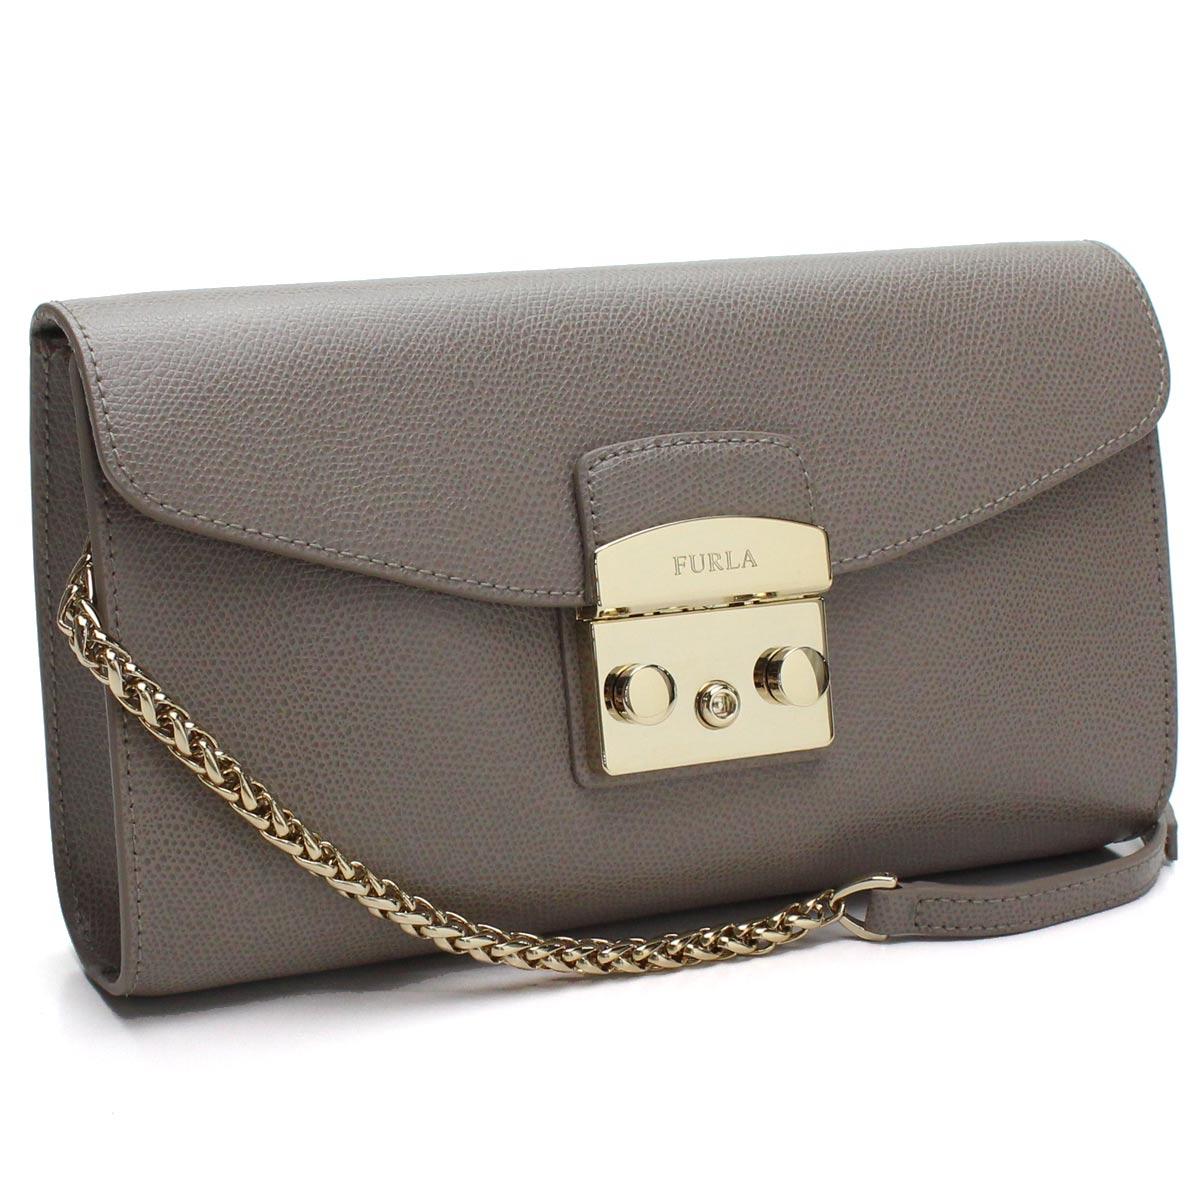 ea1f3a4e5 Bighit The total brand wholesale: フルラ FURLA METROPOLIS metropolis shoulder  bag BOT6 962804 ARE SBB SABBIA gray system | Rakuten Global Market